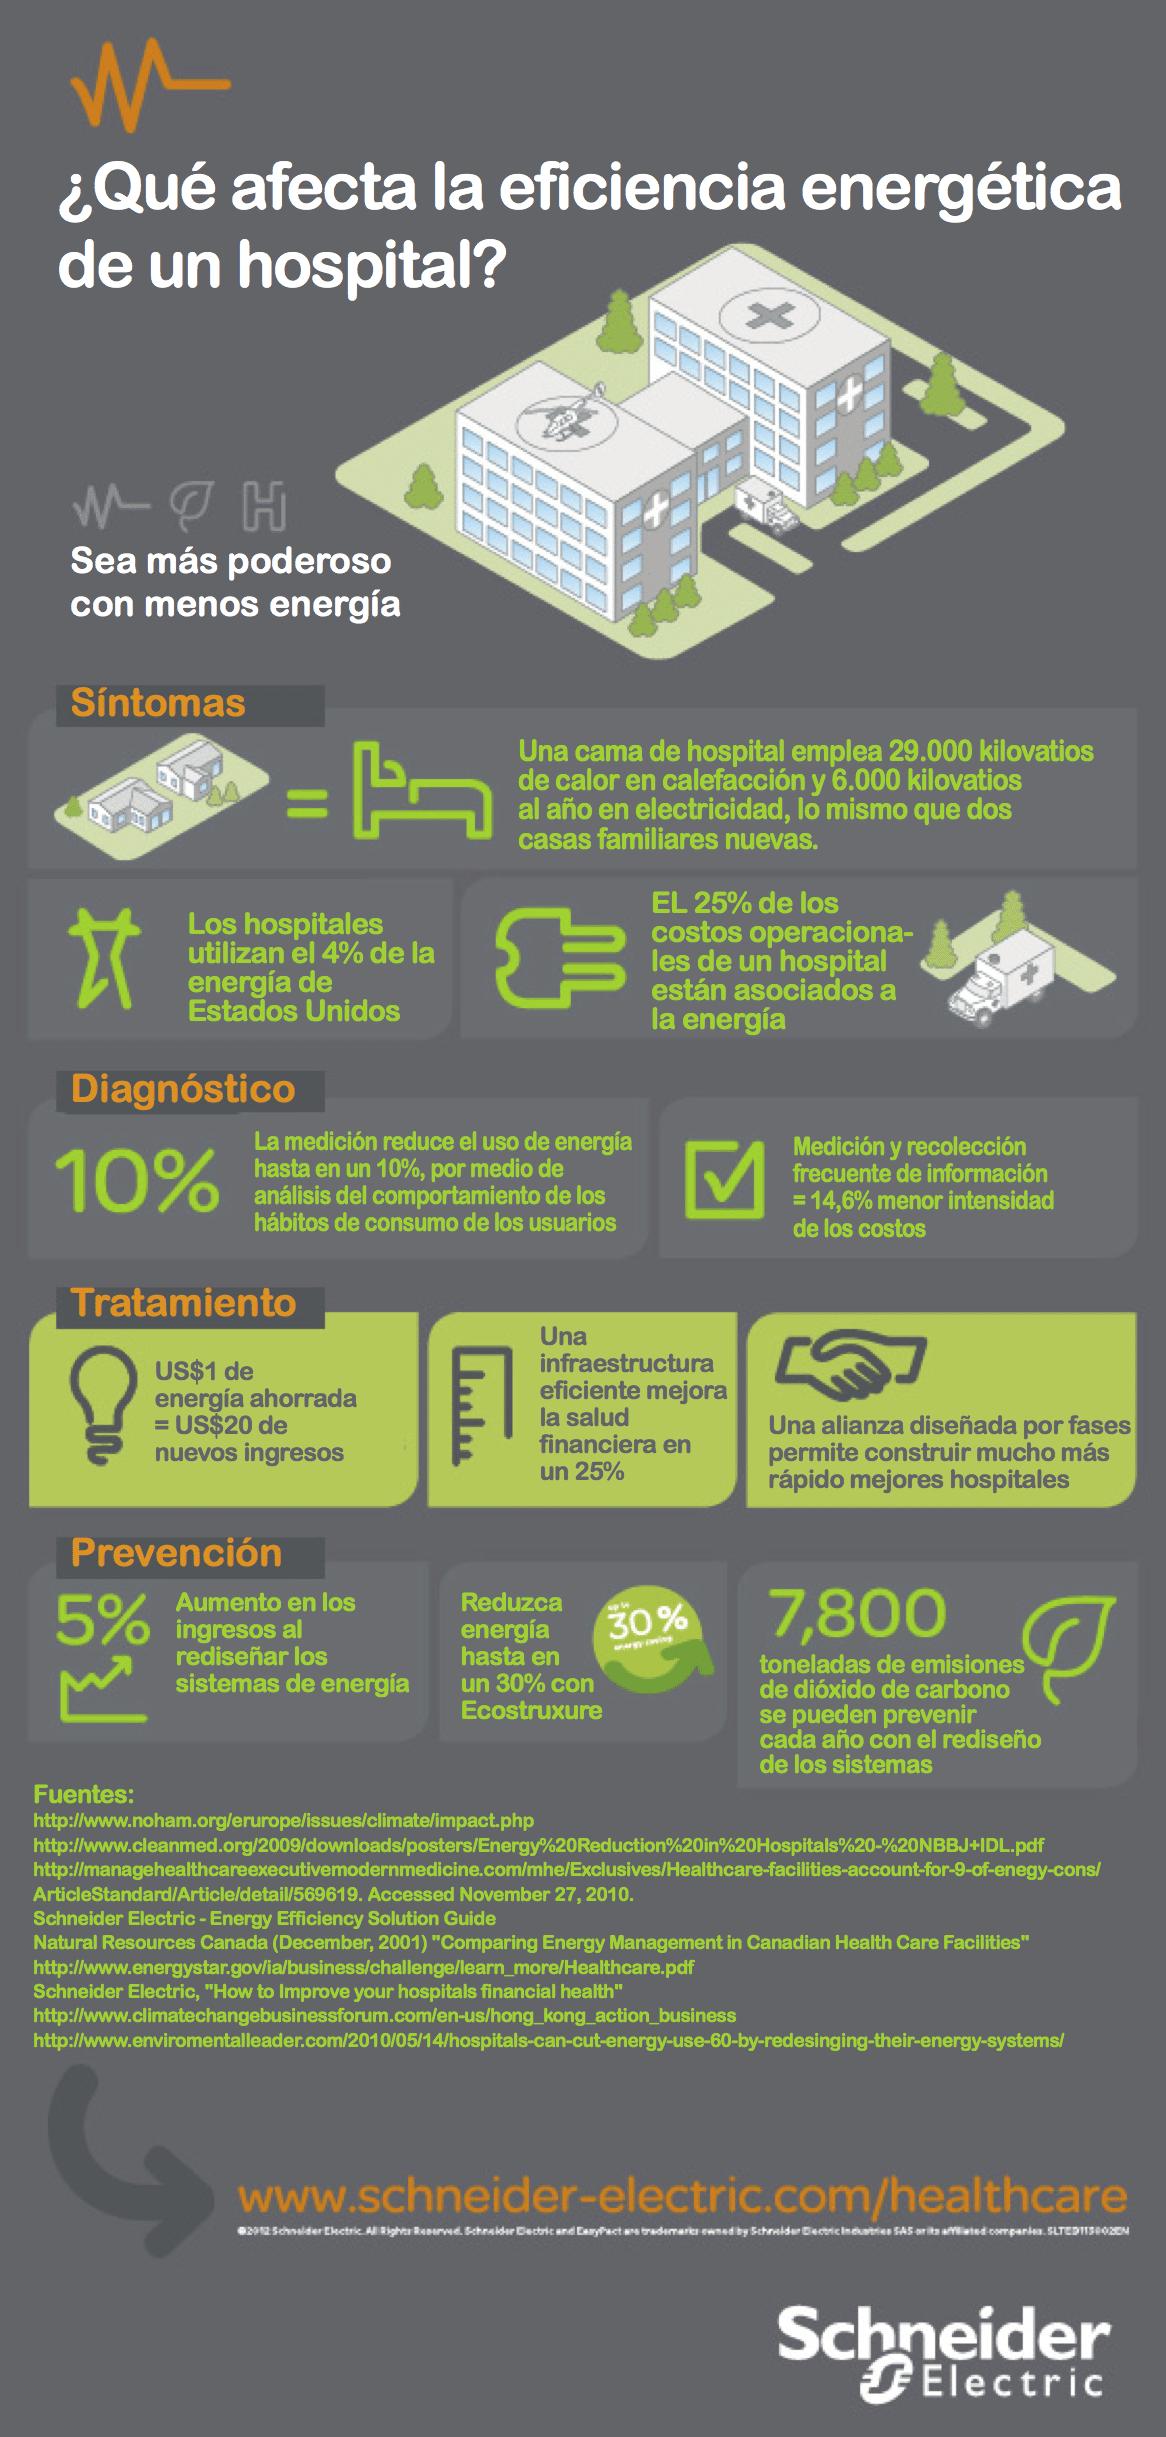 eficiencia energética en un hospital